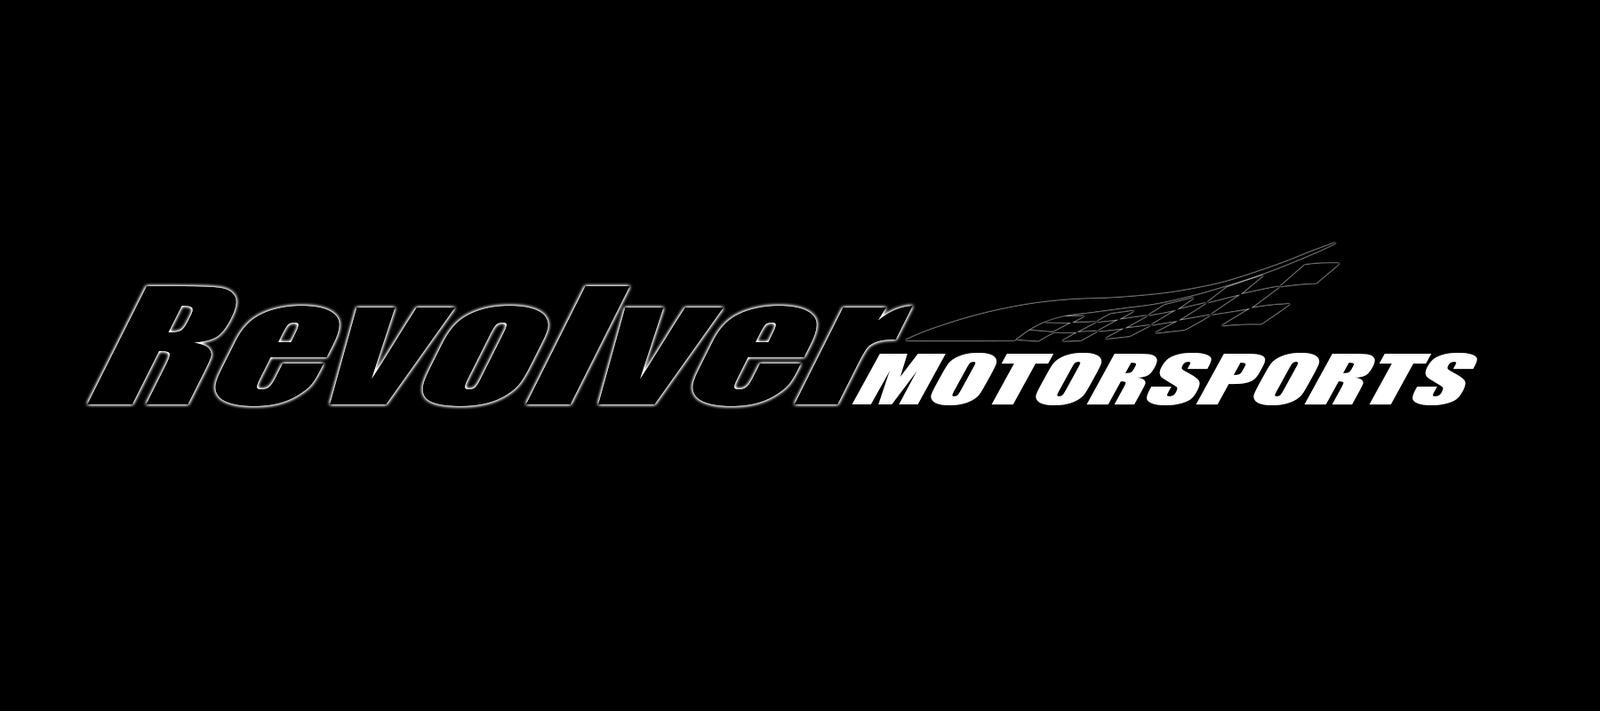 Revolver Motorsports